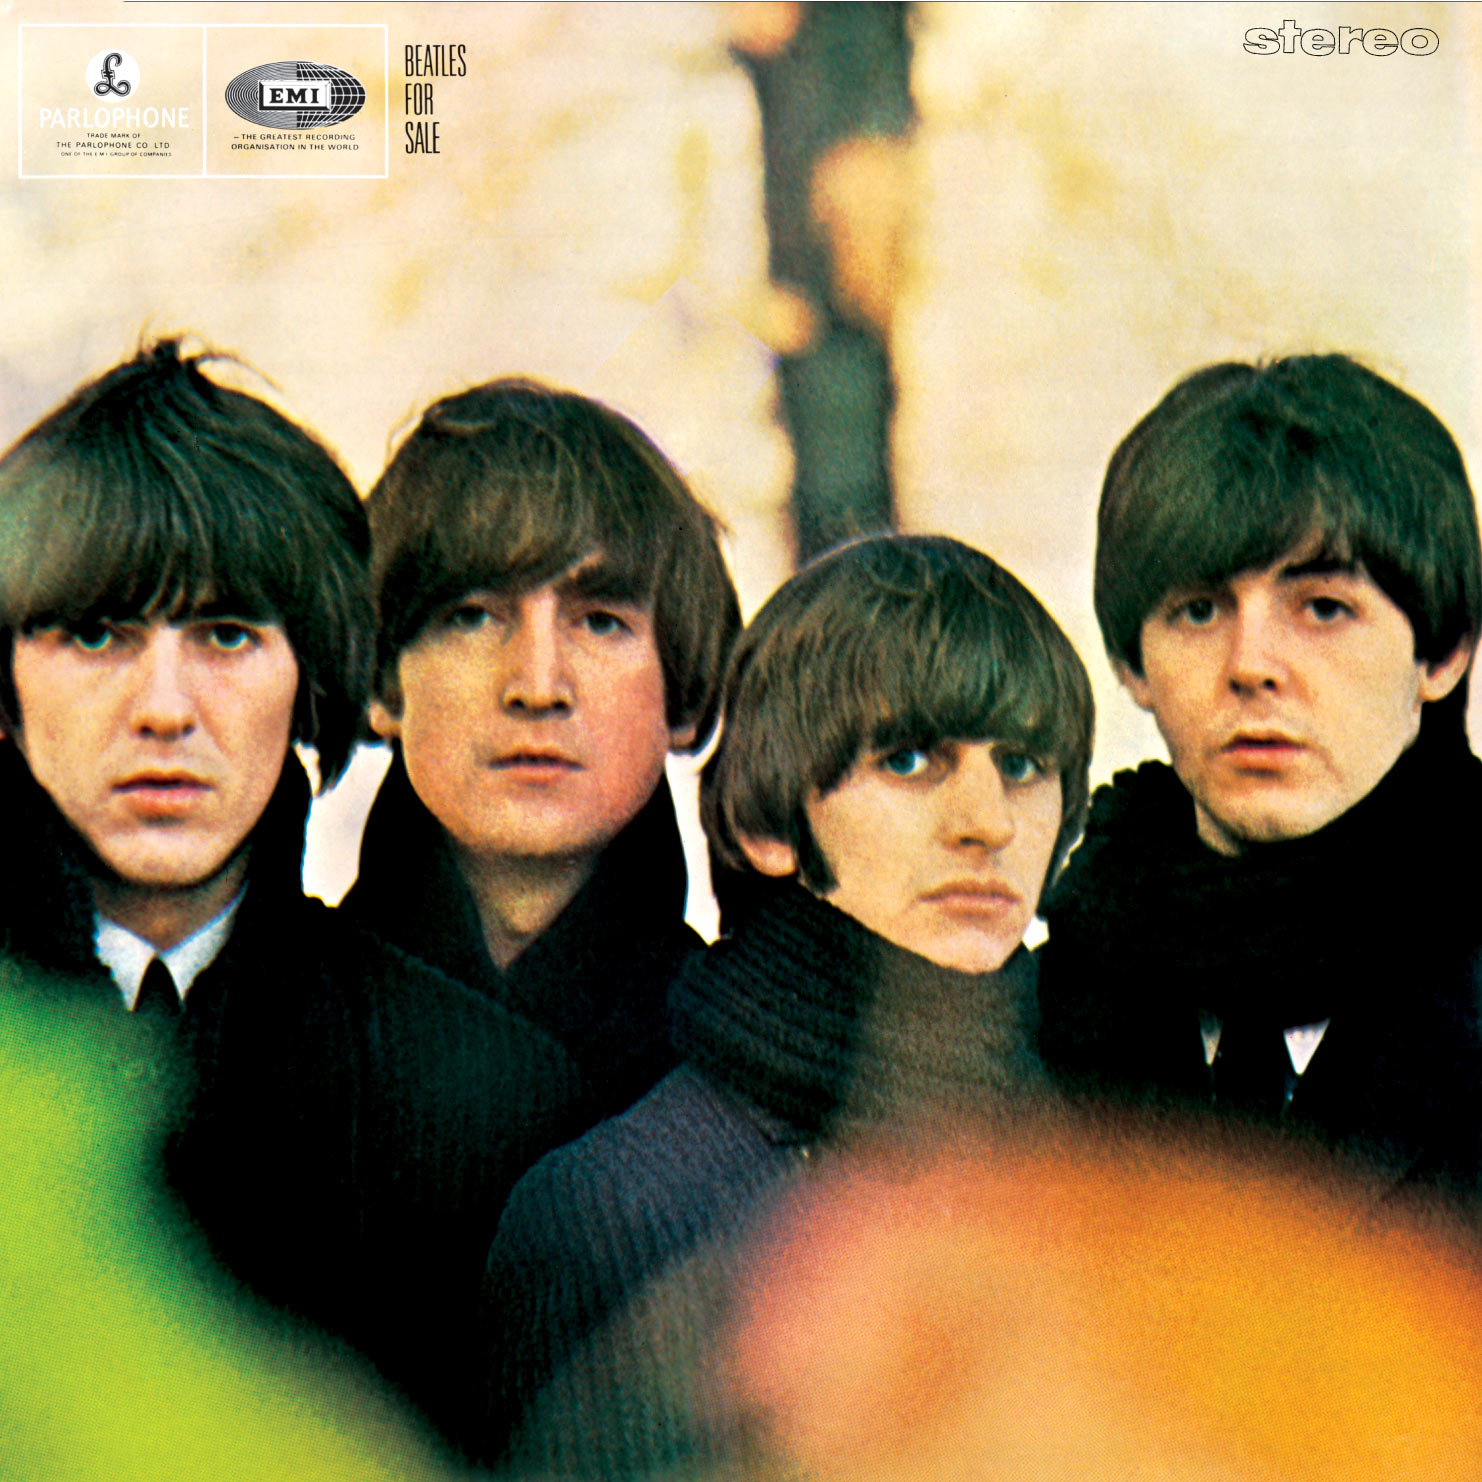 Beatles | Beatles for Sale | EMI, 1964